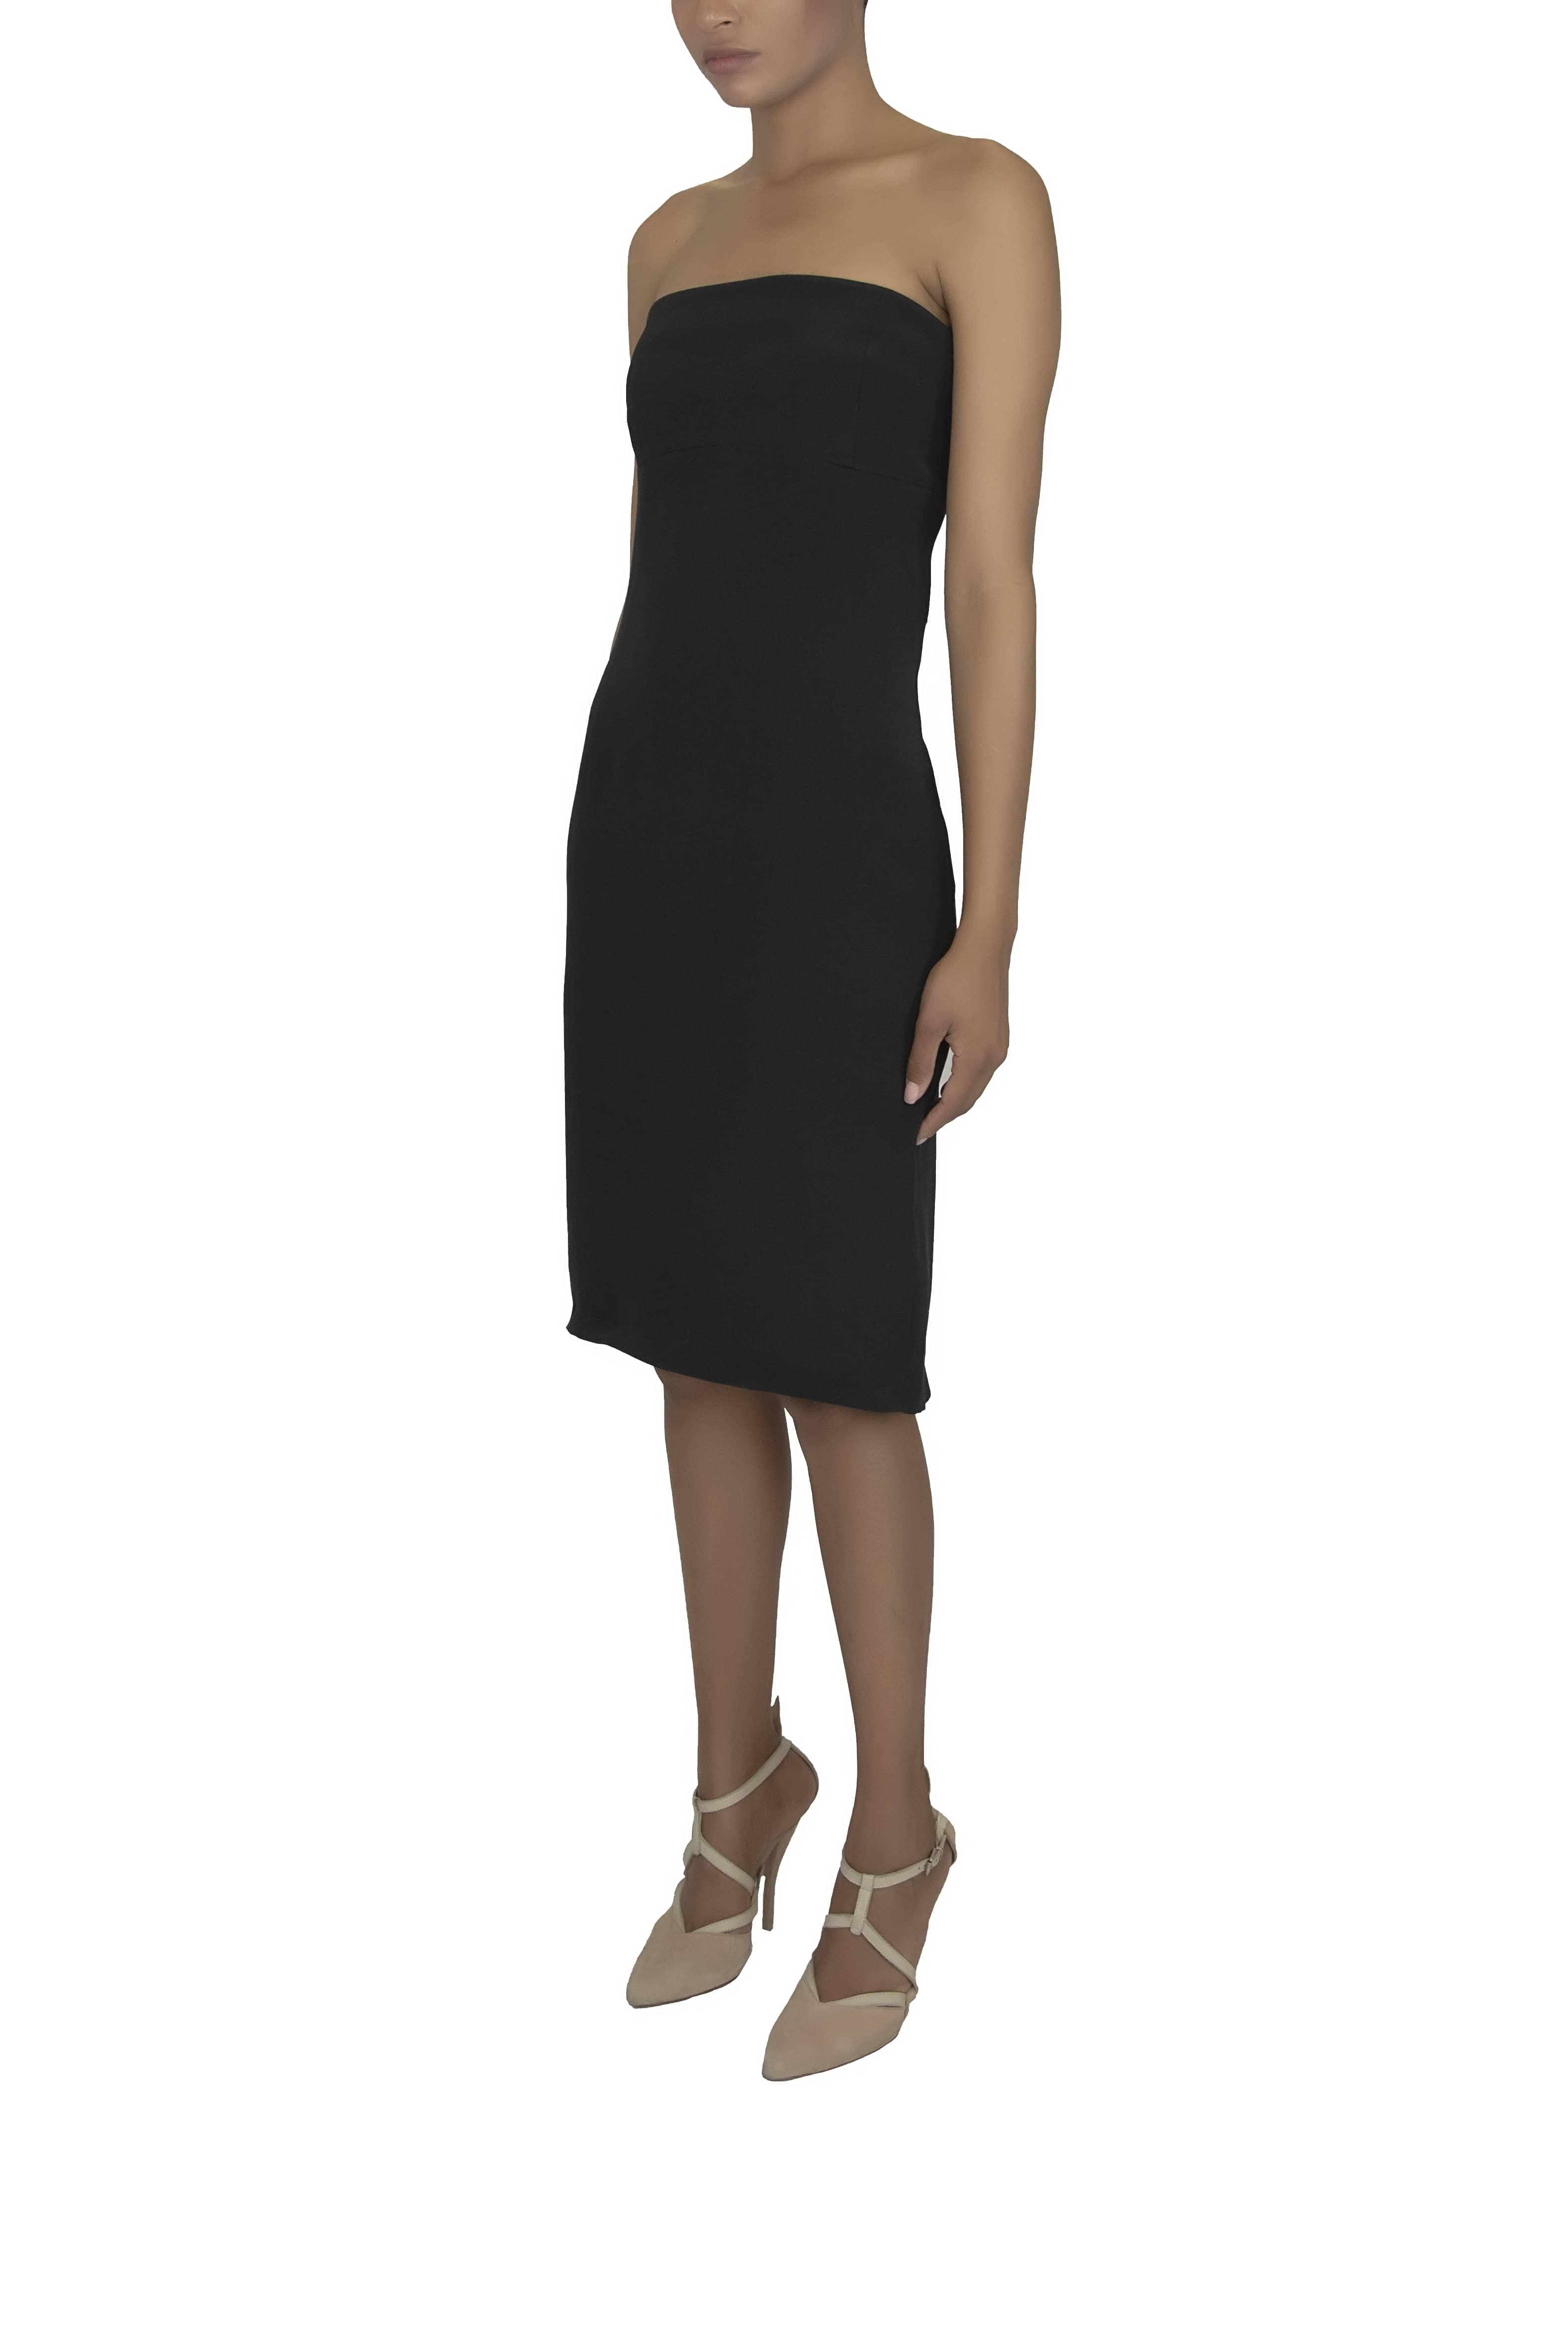 Dress IMAI III 2